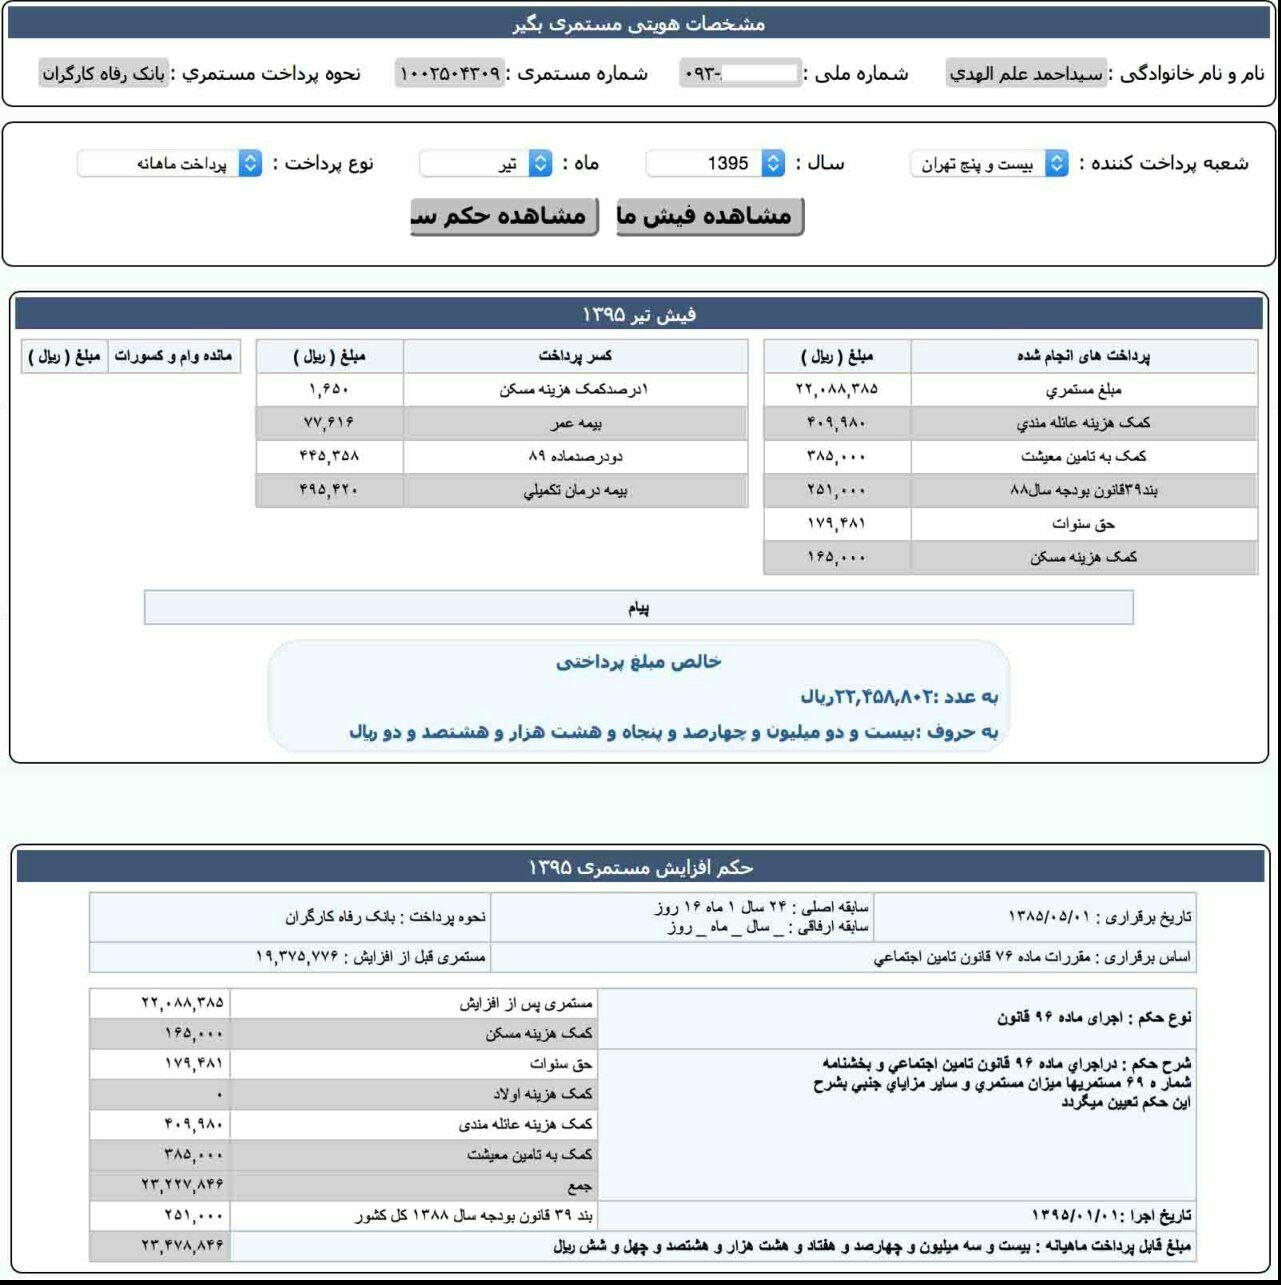 http://www.tabnak.ir/files/fa/news/1395/4/20/611172_255.jpg